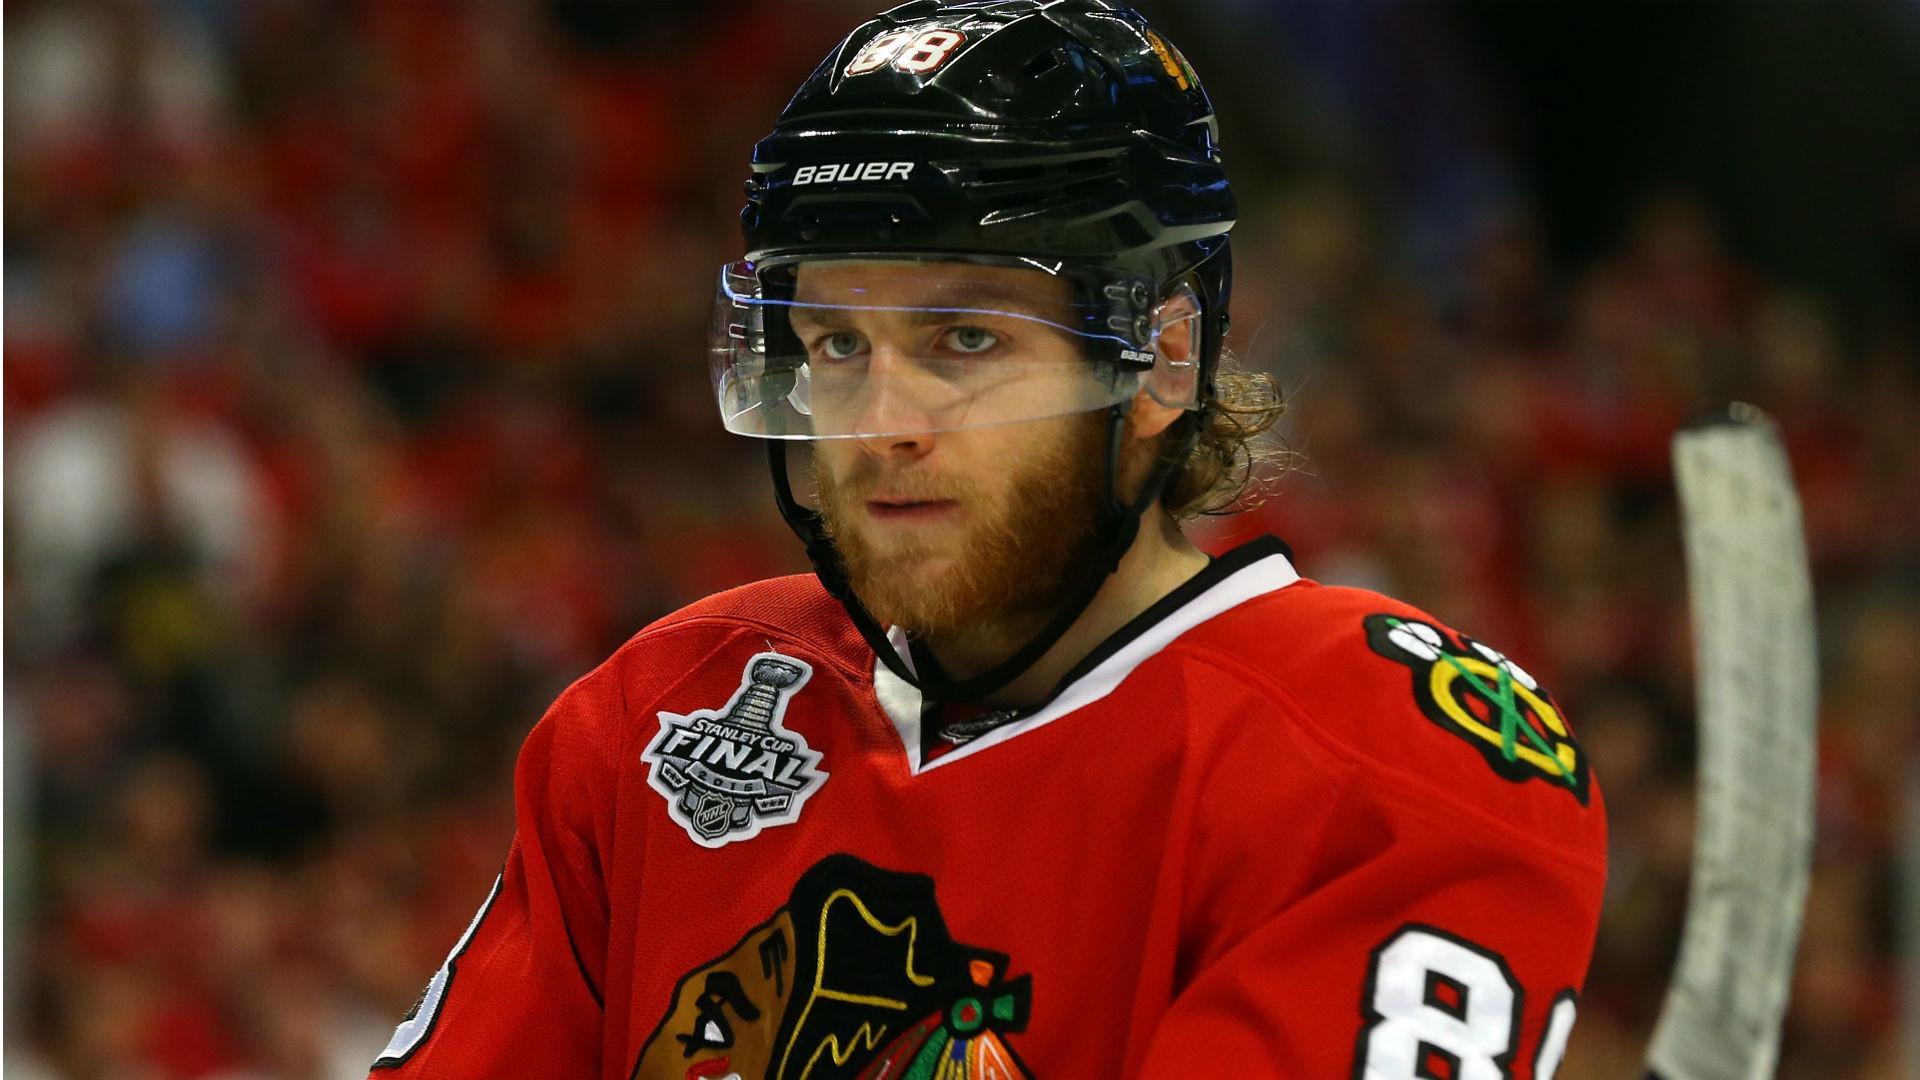 Patrick Kane greeted with applause in Blackhawks' preseason opener | NHL |  Sporting News